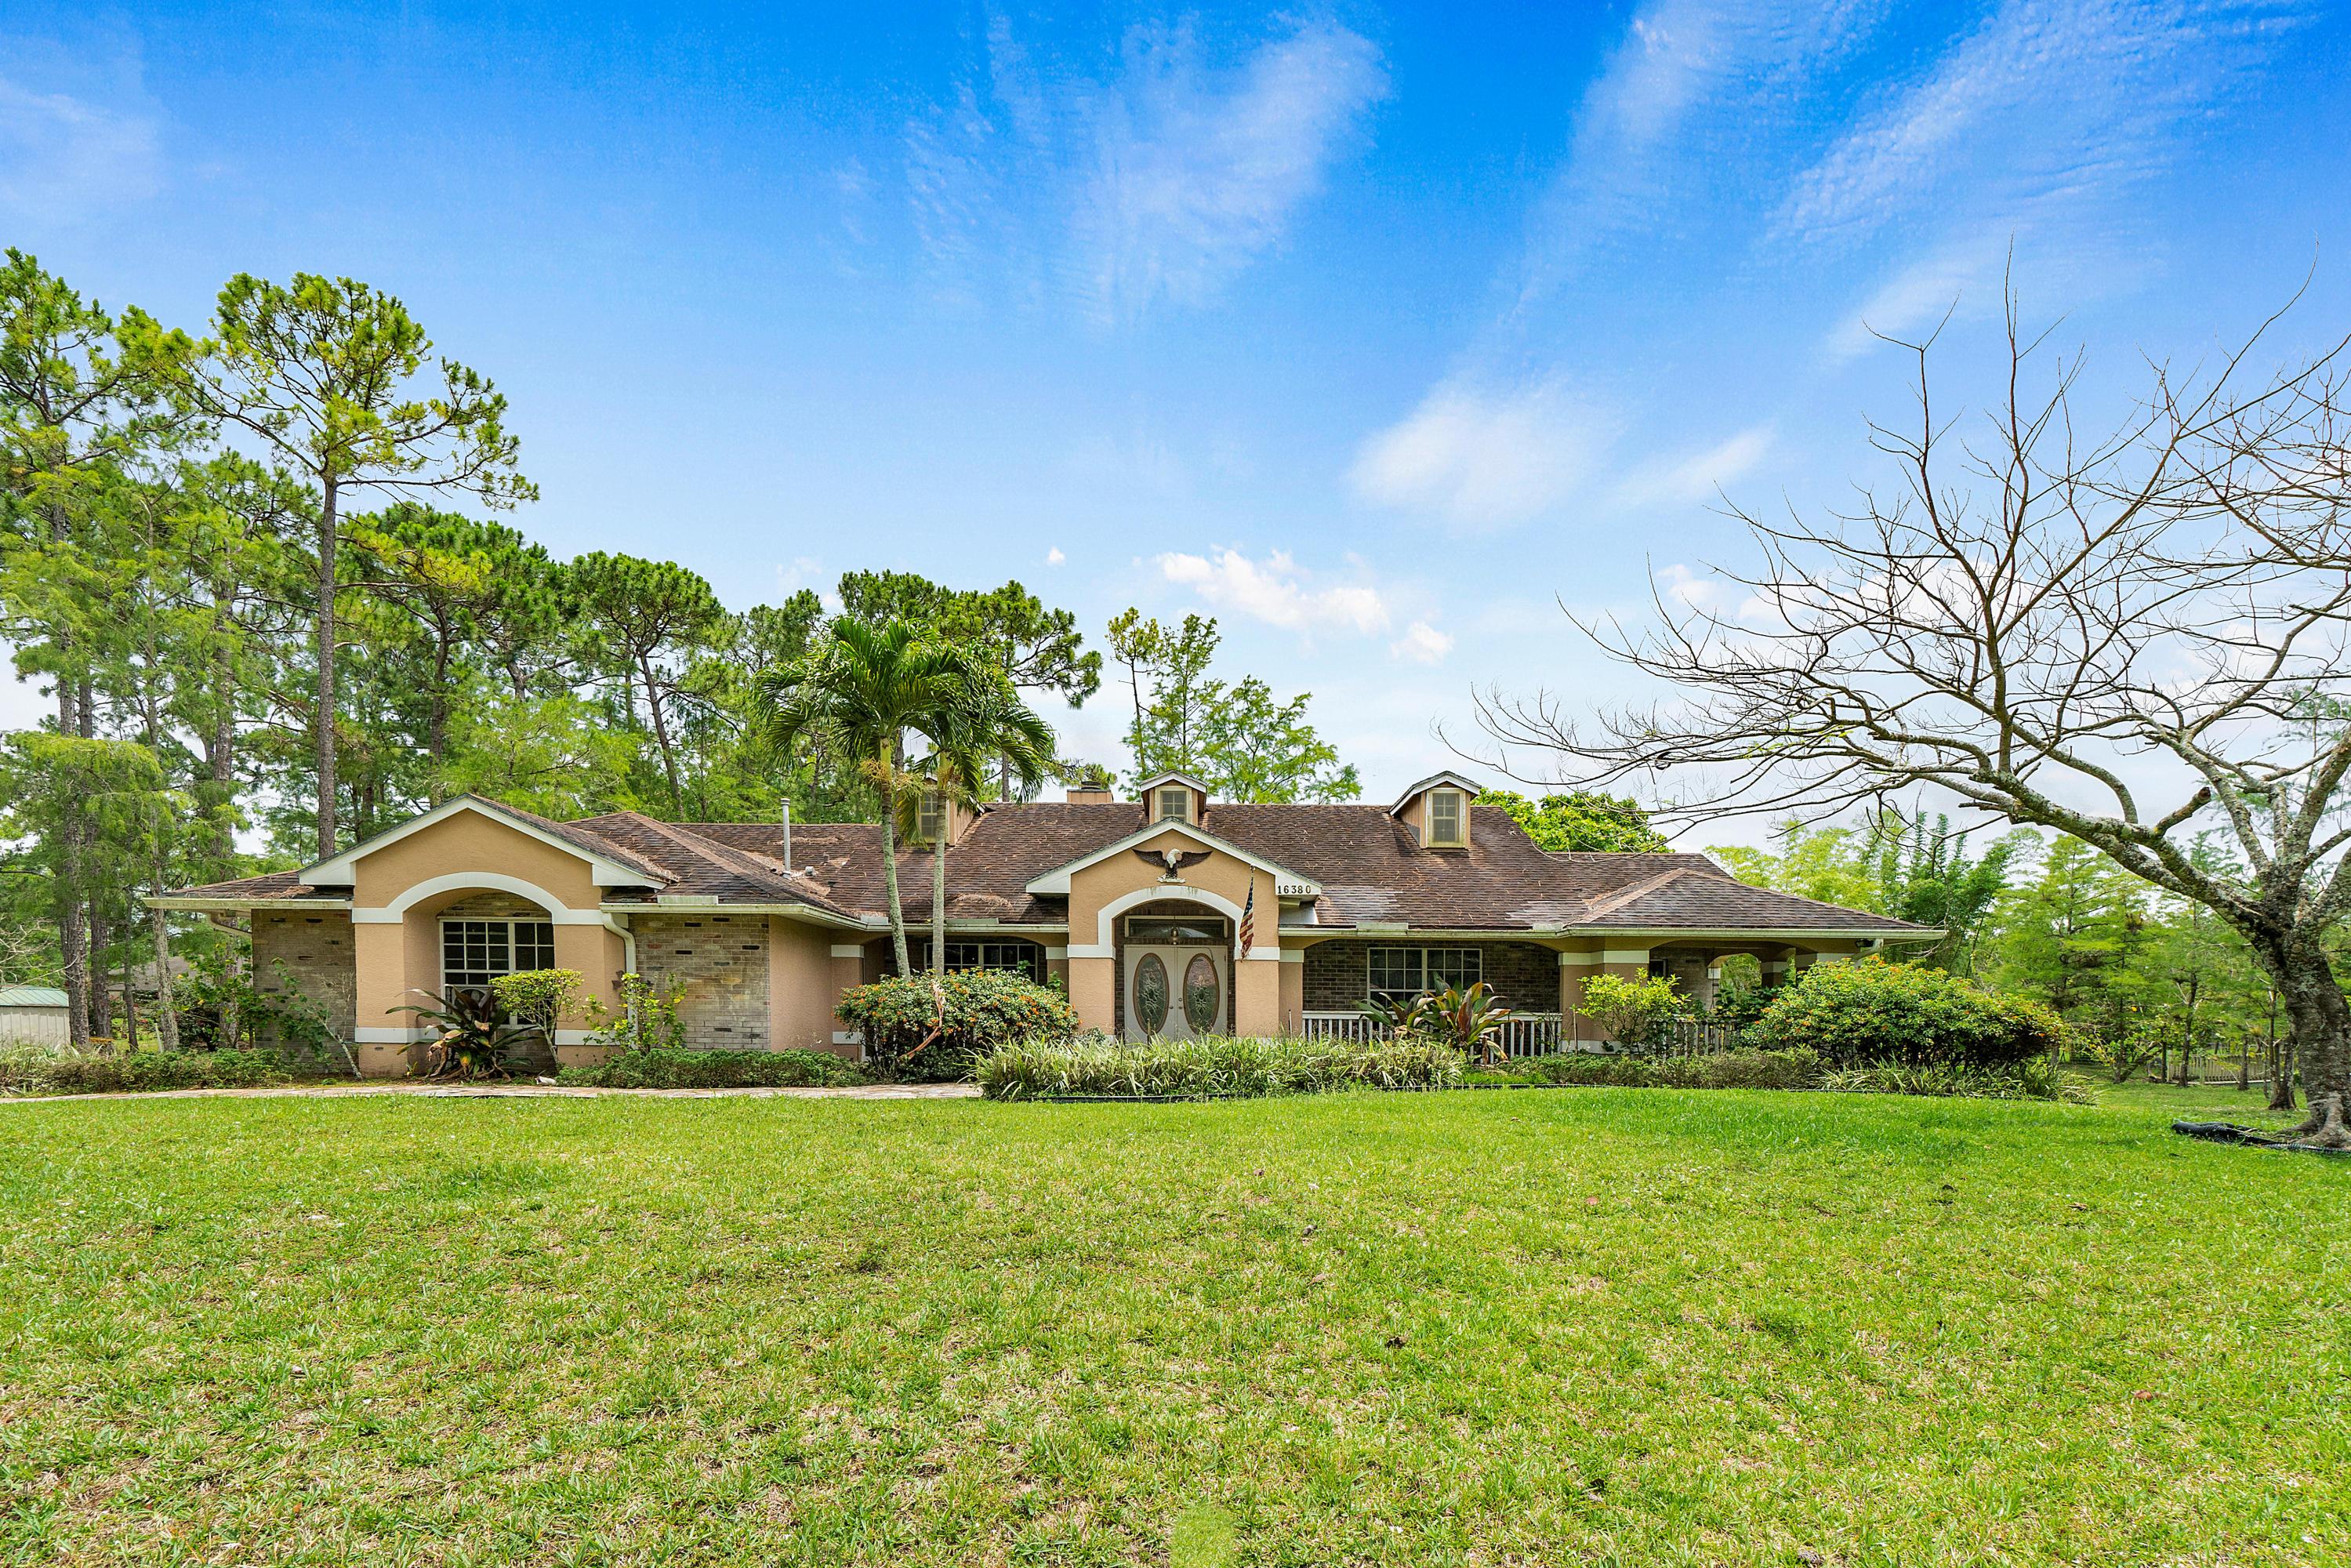 Loxahatchee- Florida 33470, 4 Bedrooms Bedrooms, ,3 BathroomsBathrooms,Residential,For Sale,67th,RX-10530333